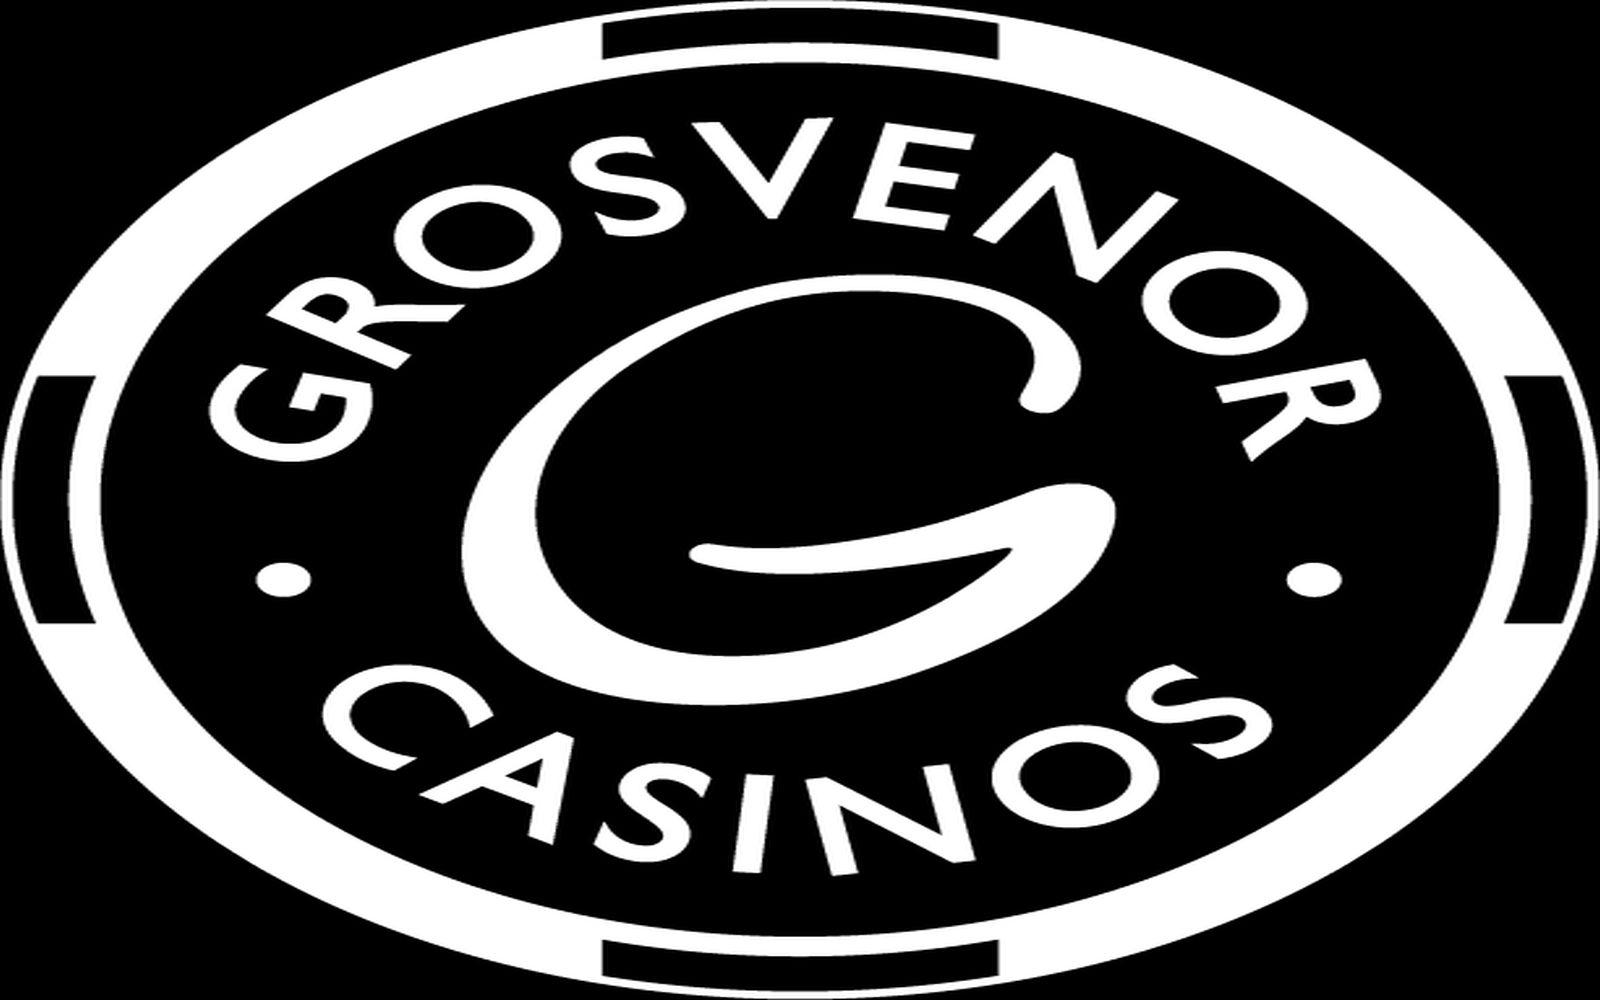 Grosvenor Newcastle